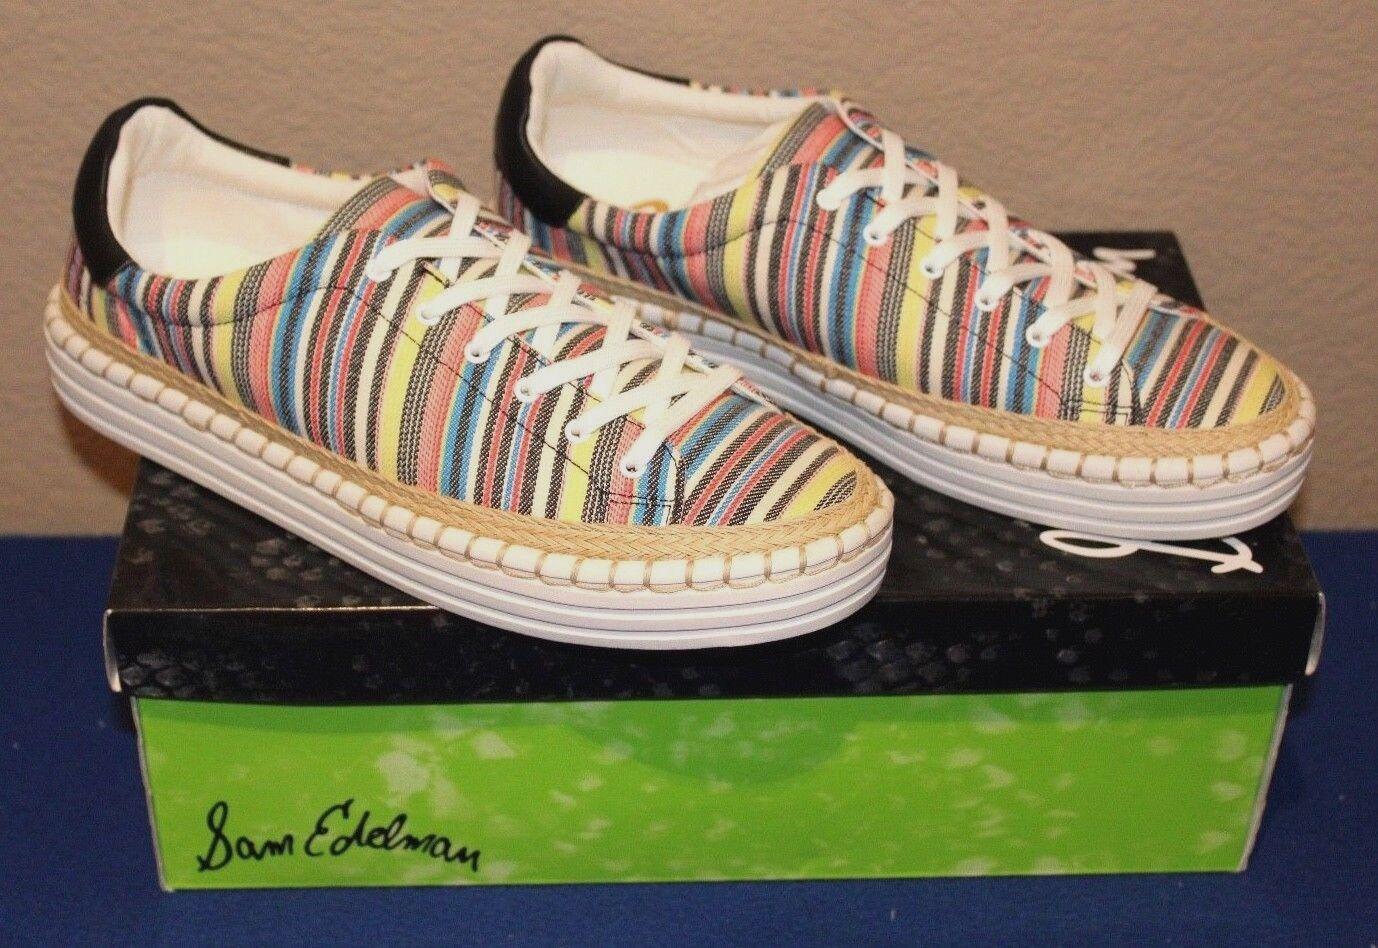 Sam Edelman Kavi Ivory Multi/Black Comfort Womens Athletic Shoes Size 7.5 New